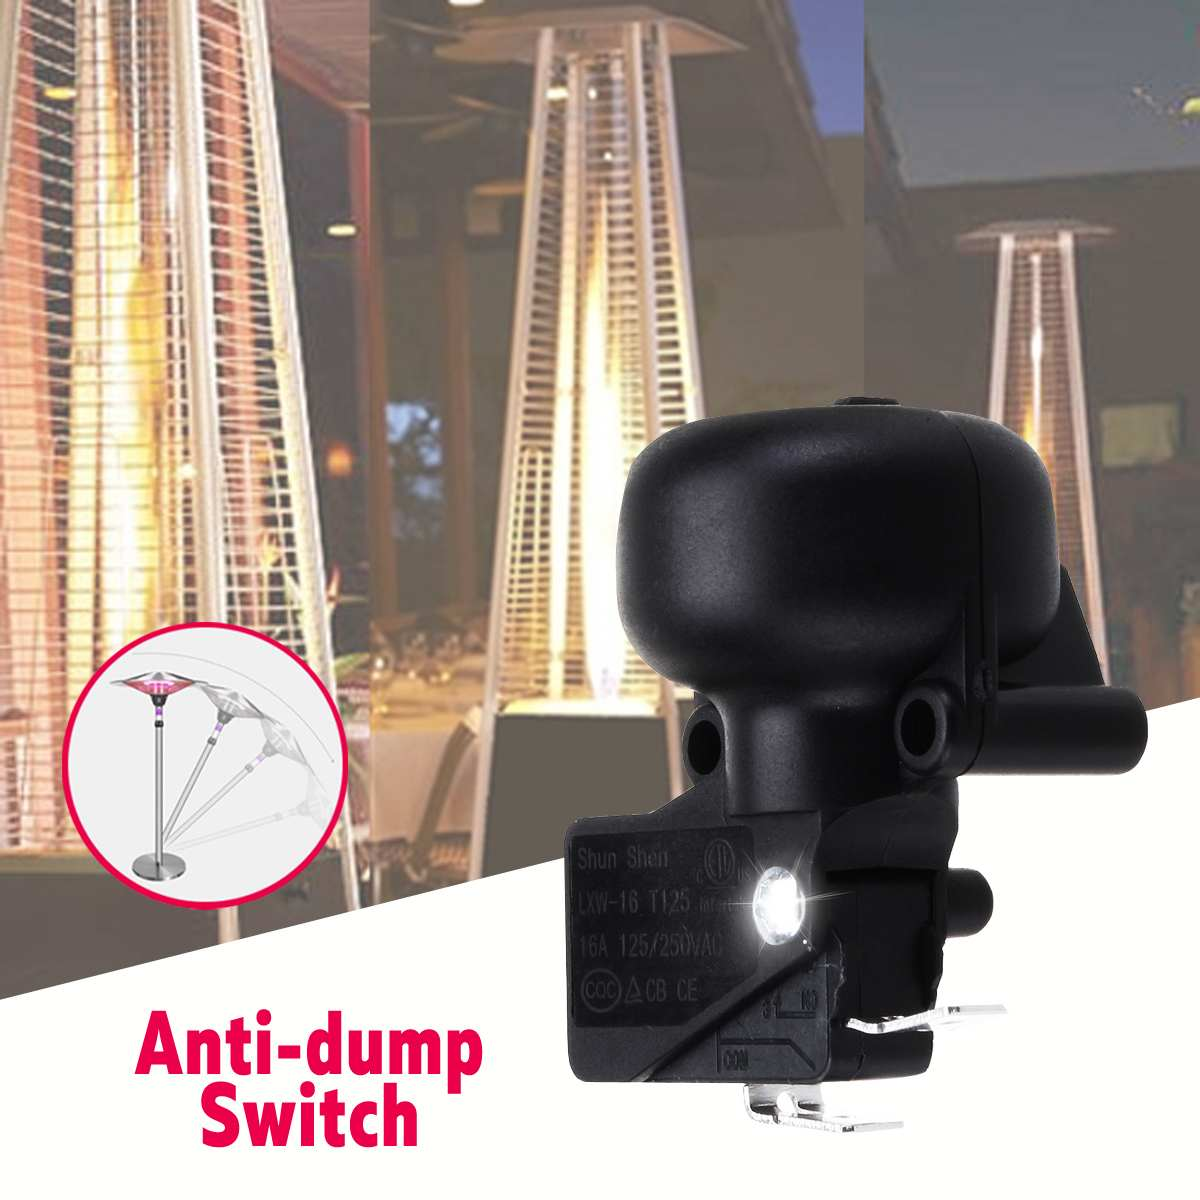 ExcLent Universal Ac 220V 50Hz Anti-Dump Switch Black For Patio Heater Garden Outdoor Heater Accessoires